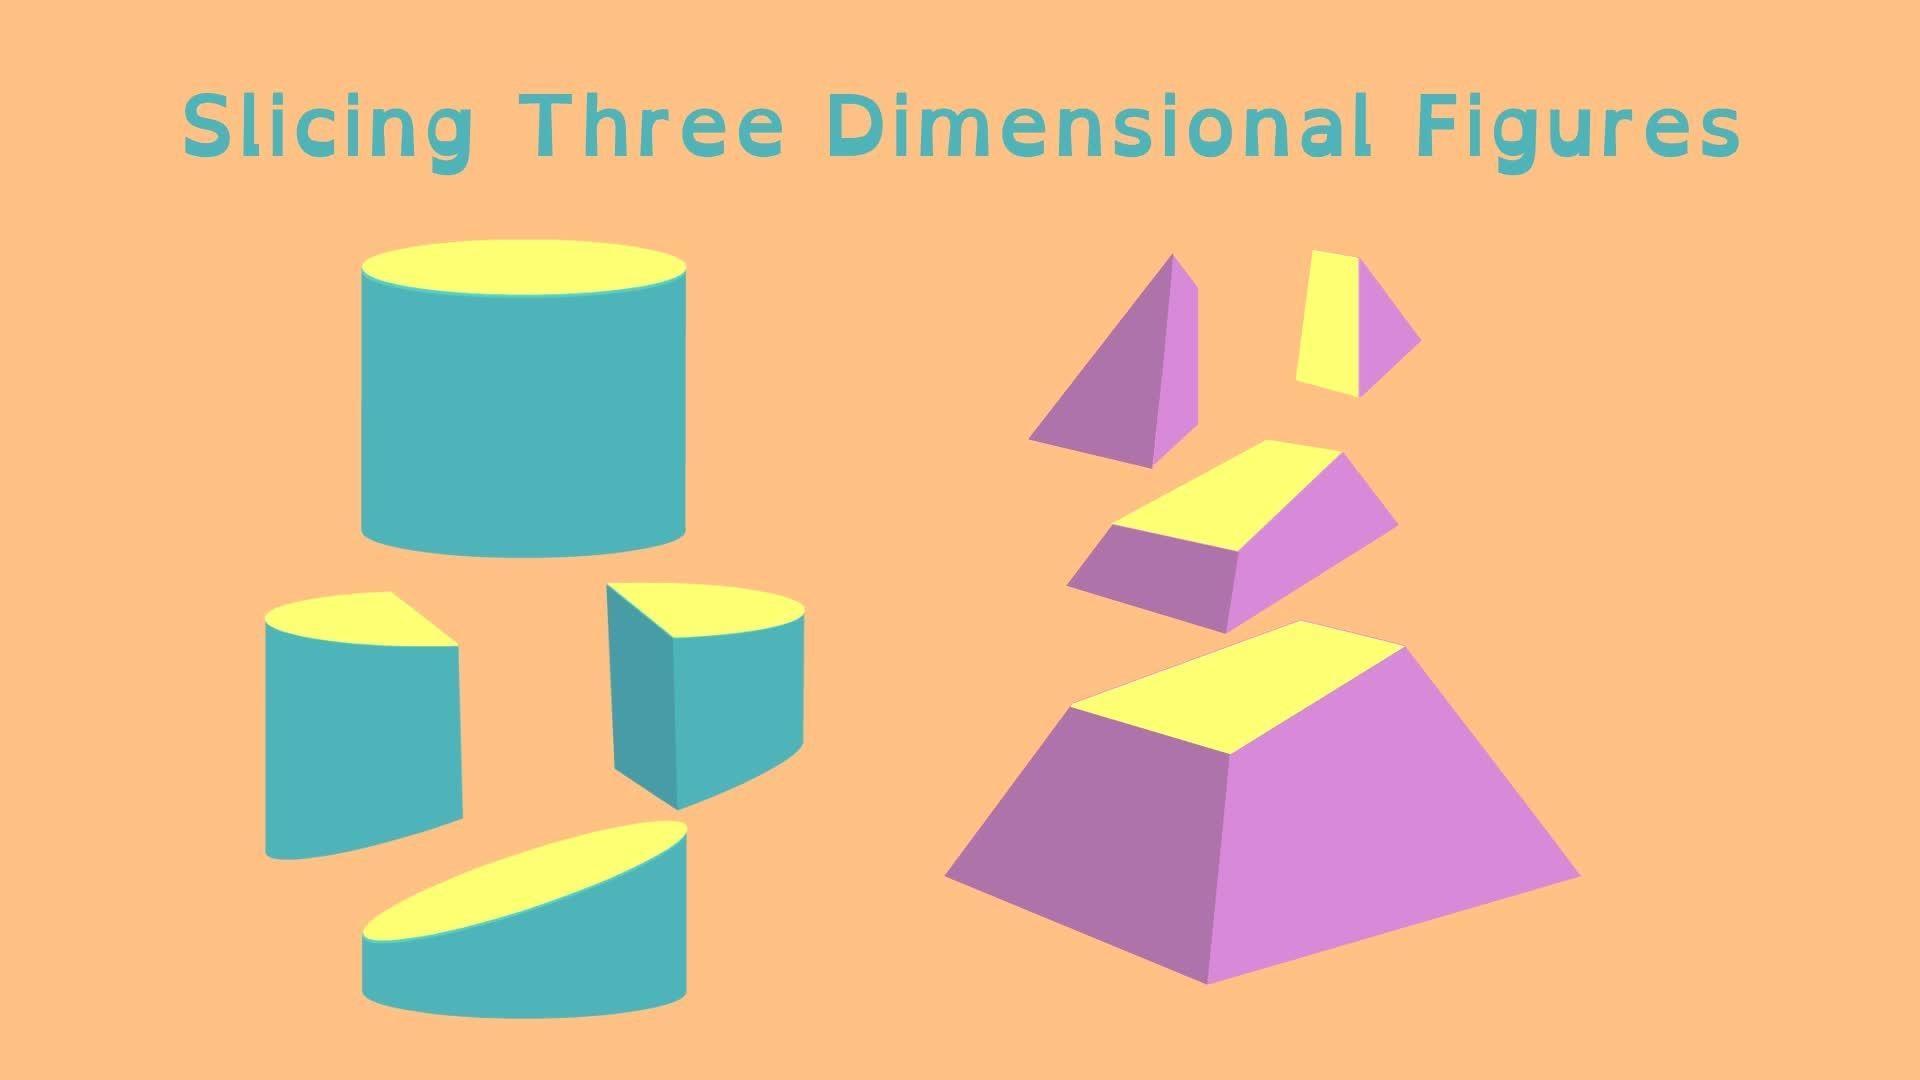 Slicing Three Dimensional Figures